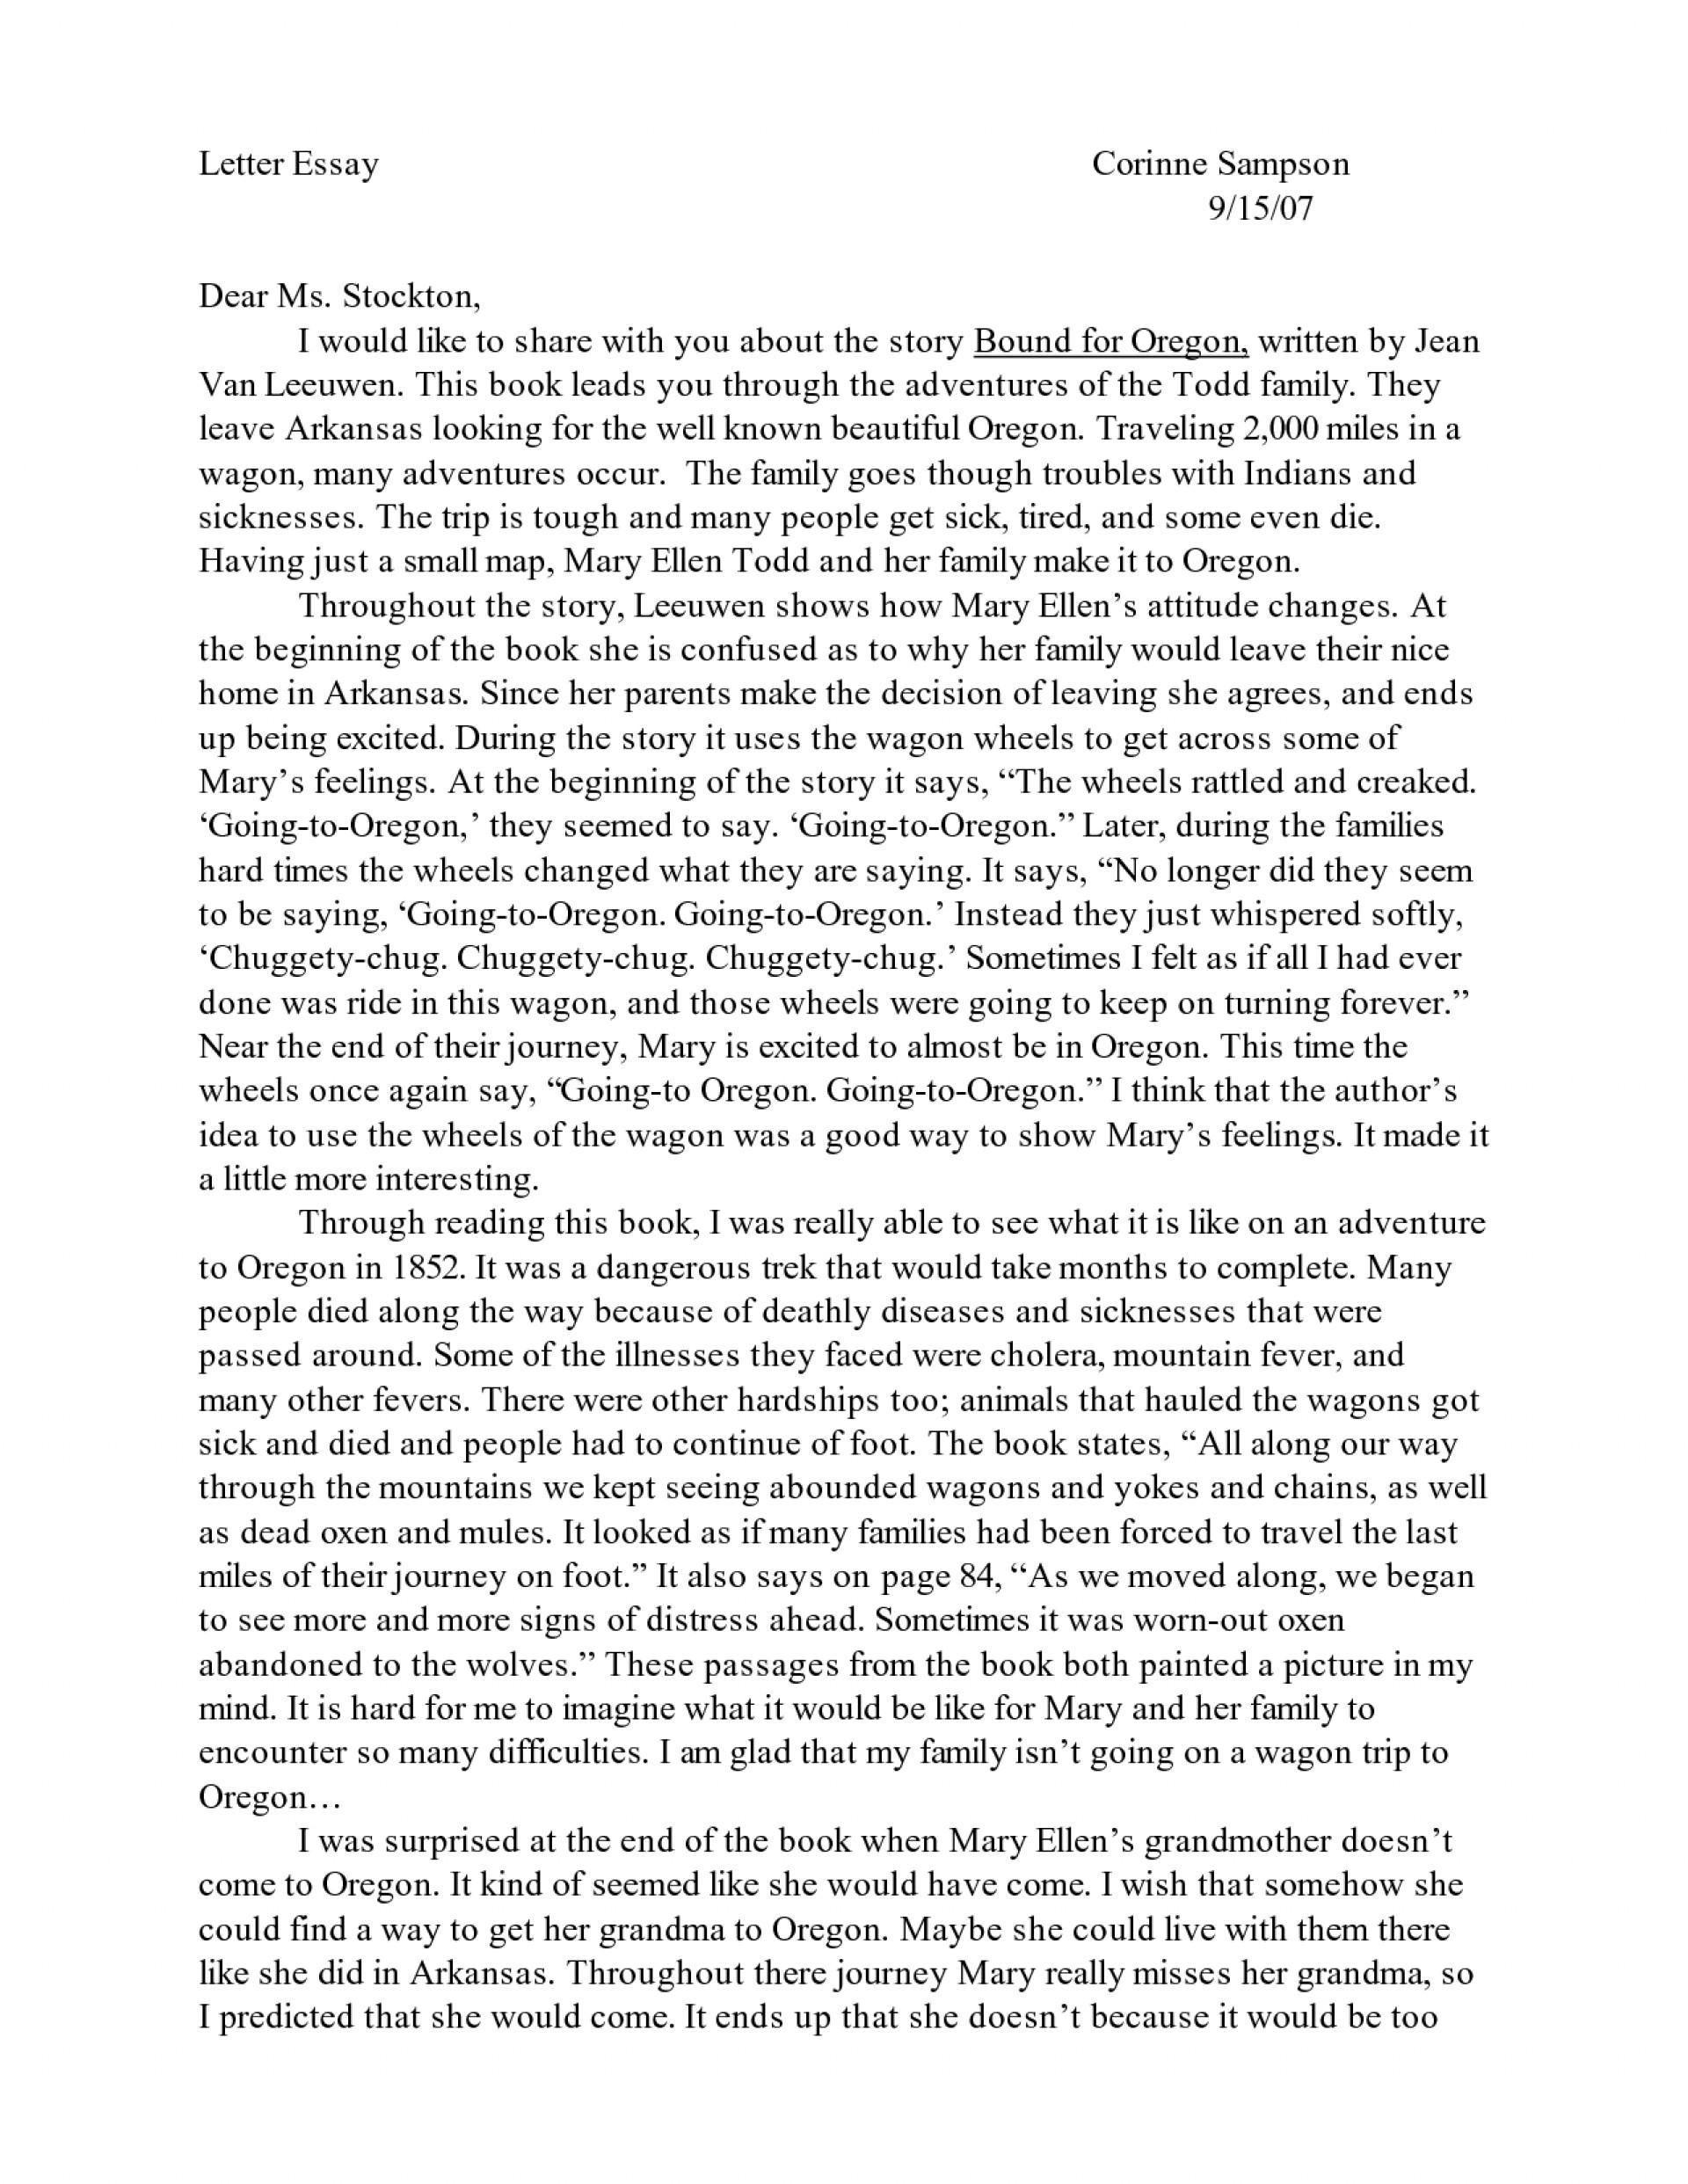 003 Sample Essay For Scholarship Incredible Mara Personal Pdf 1920